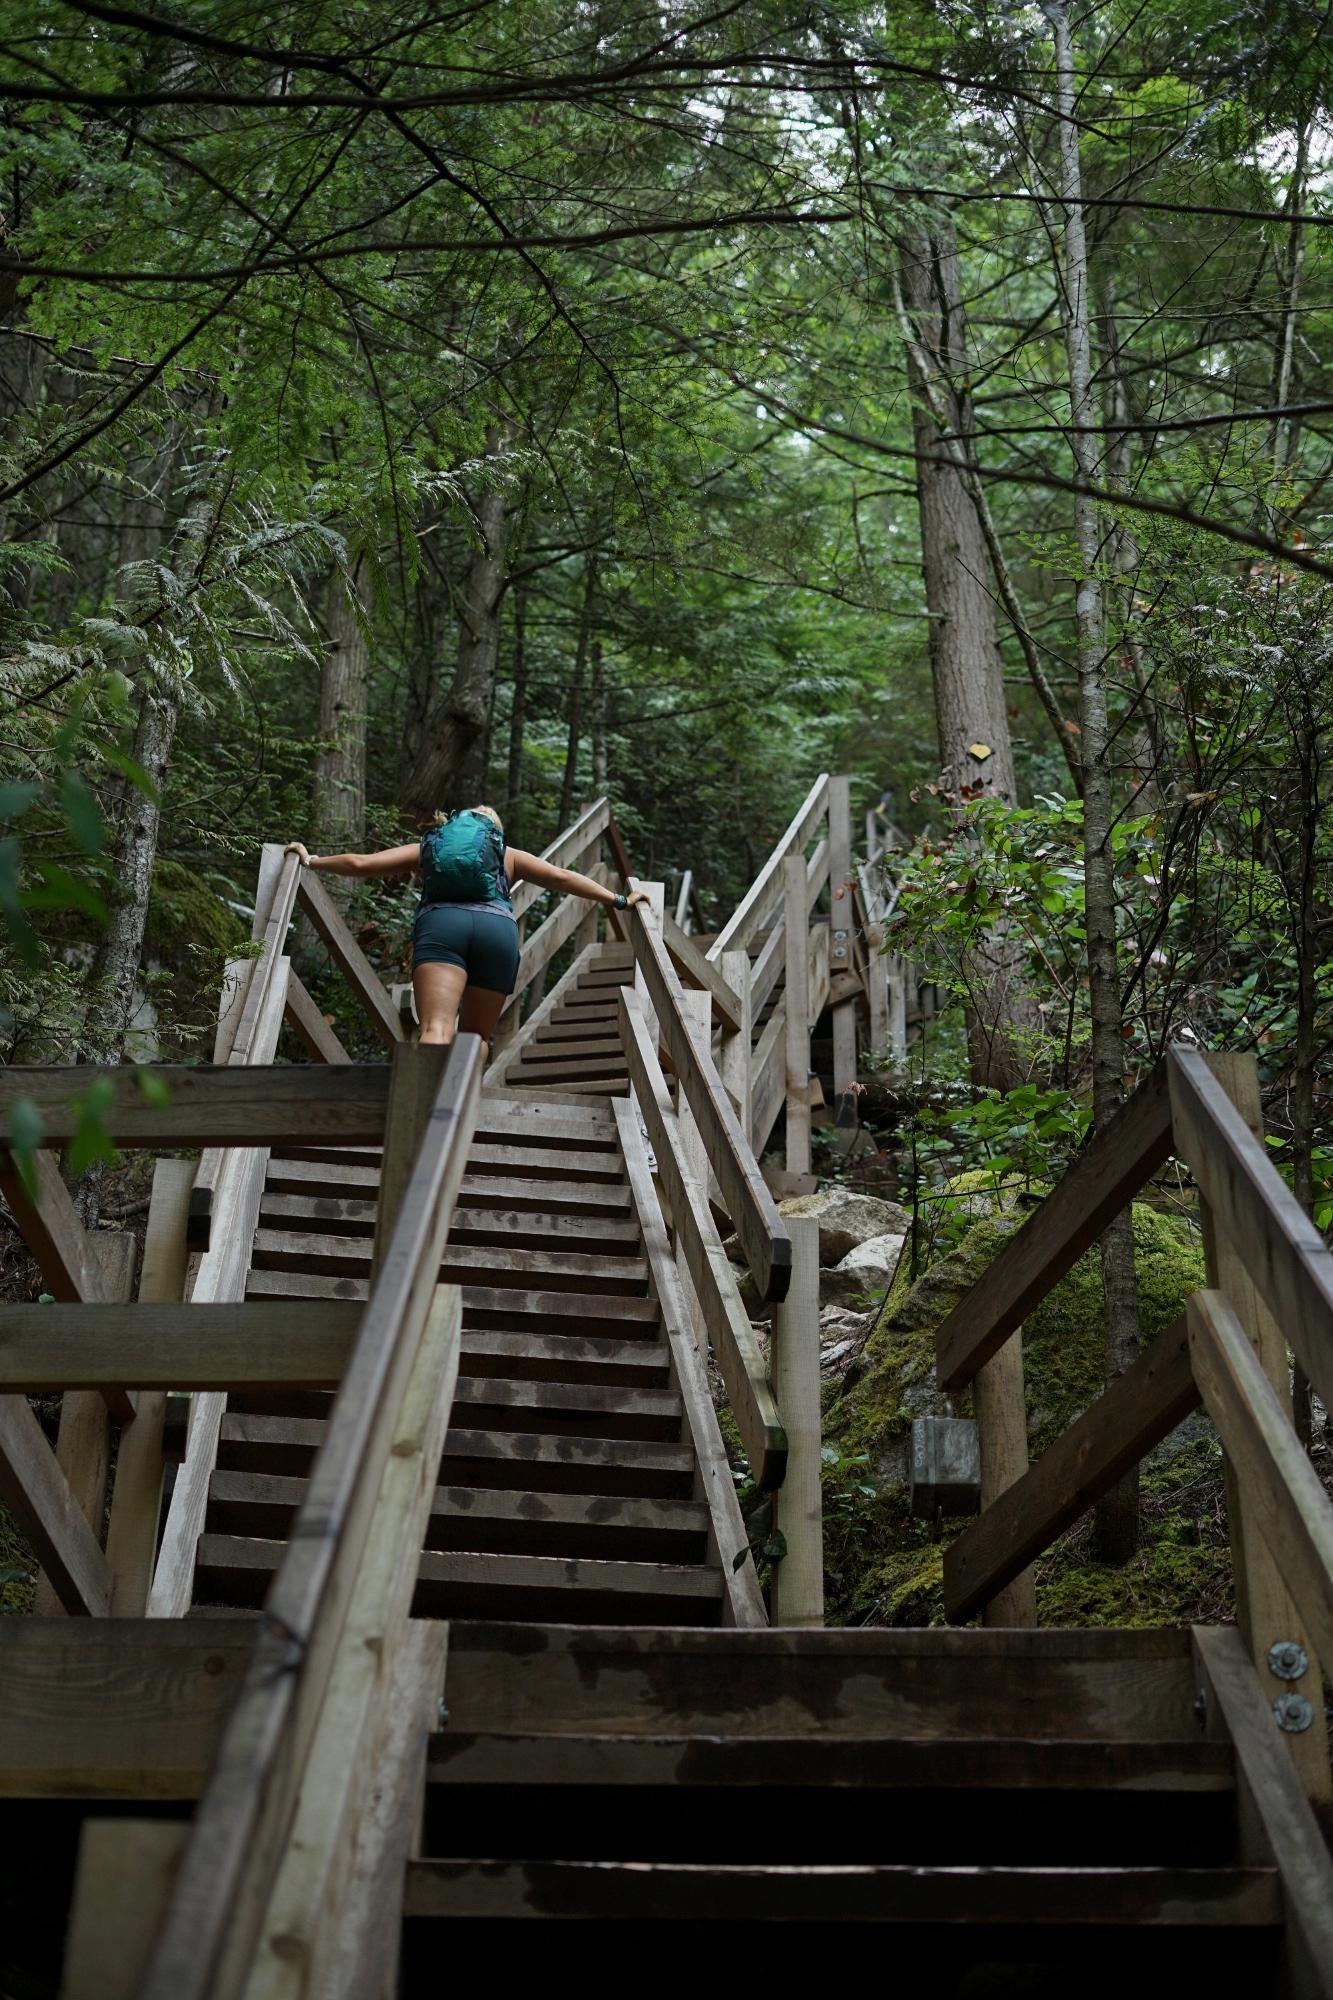 It's steep!